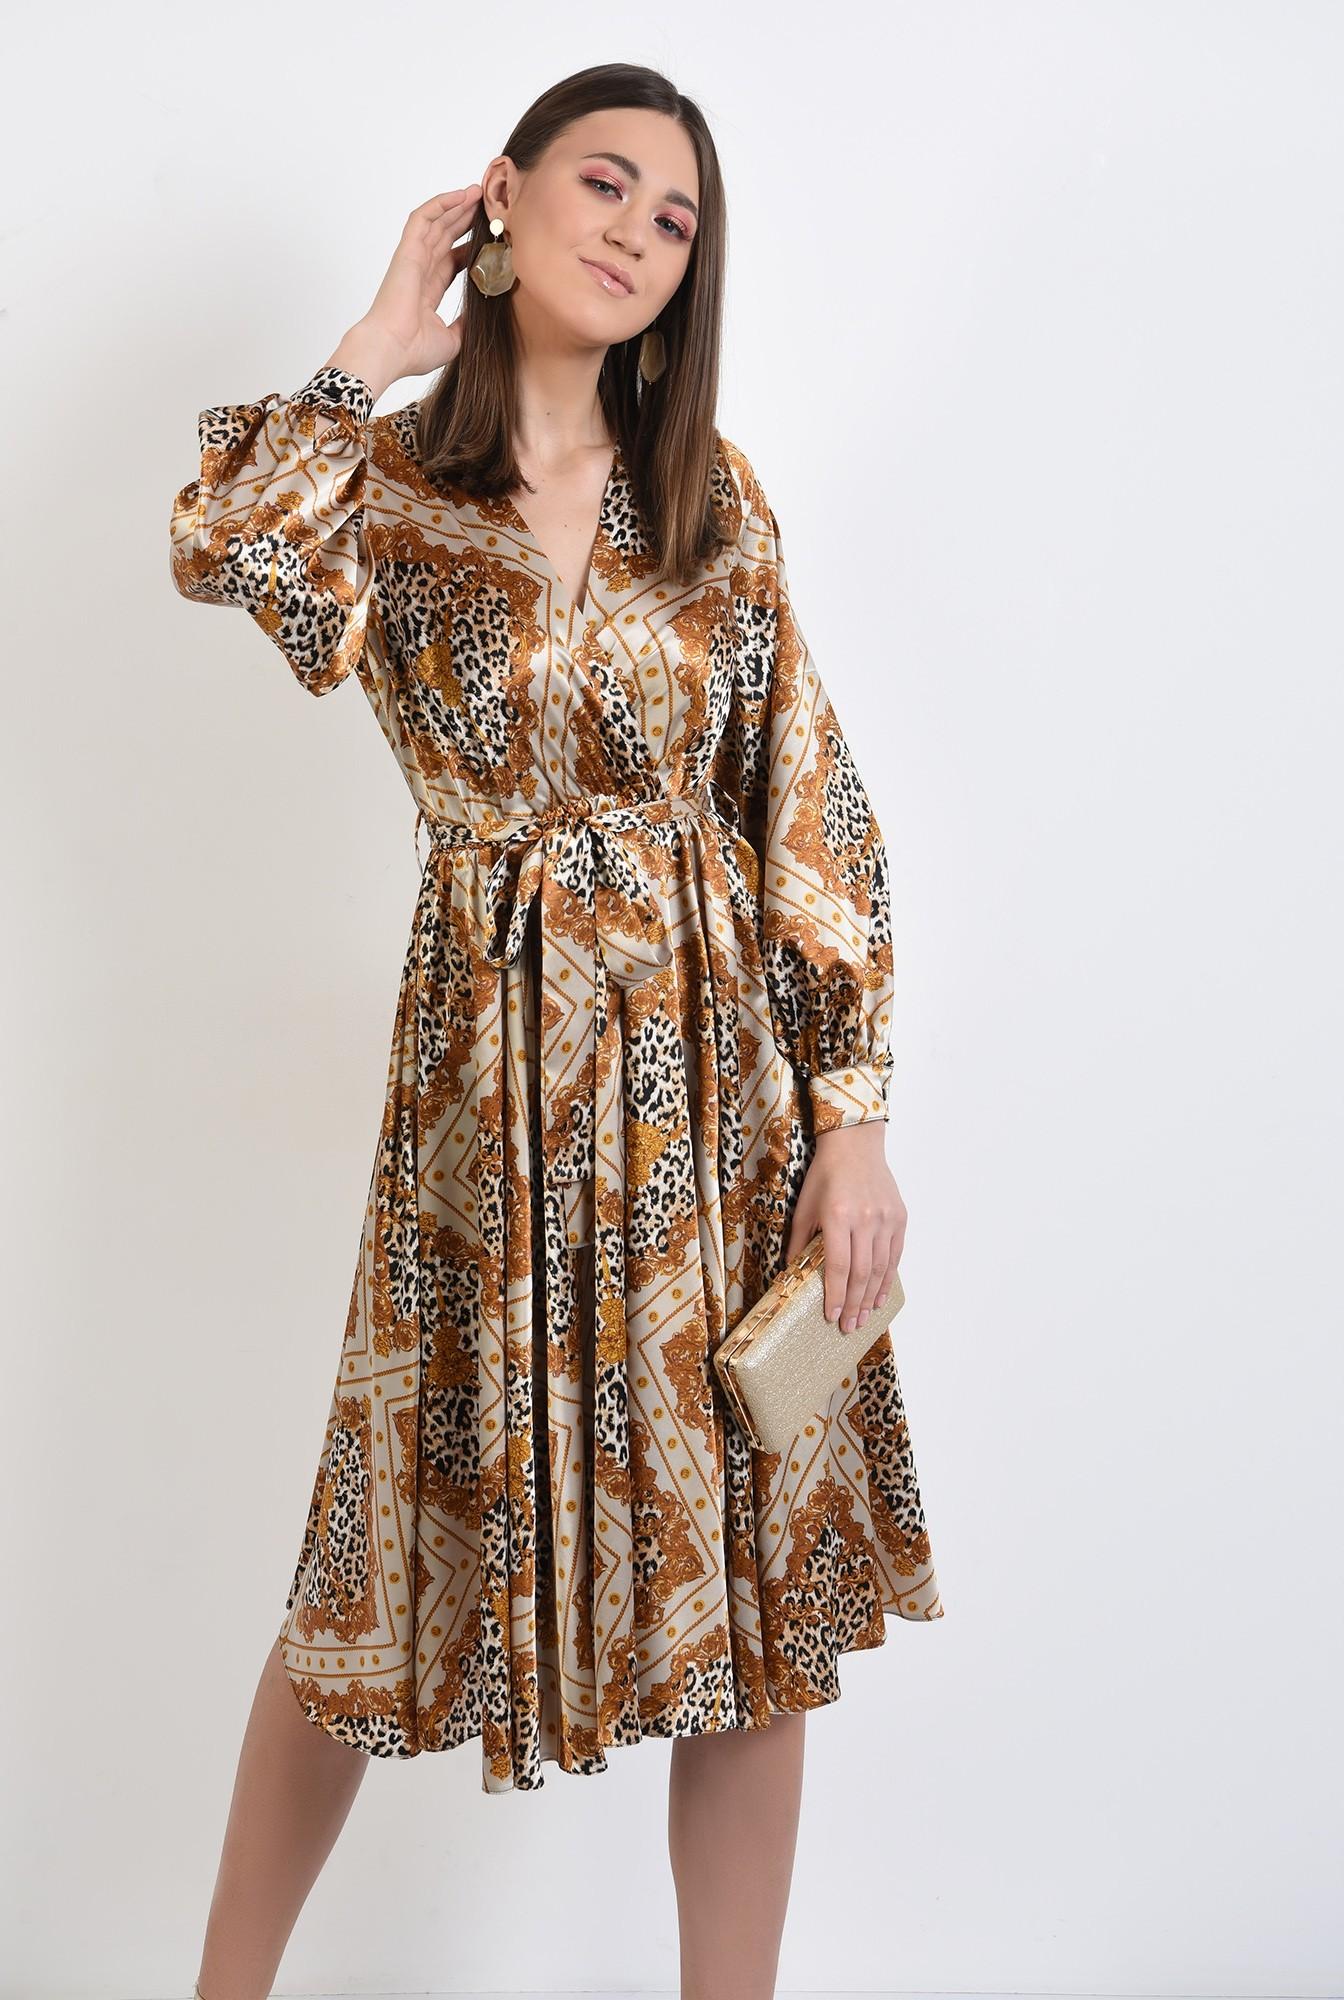 0 -  rochie eleganta, midi, evazata, cu imprimeu, animal print, rochie de primavara